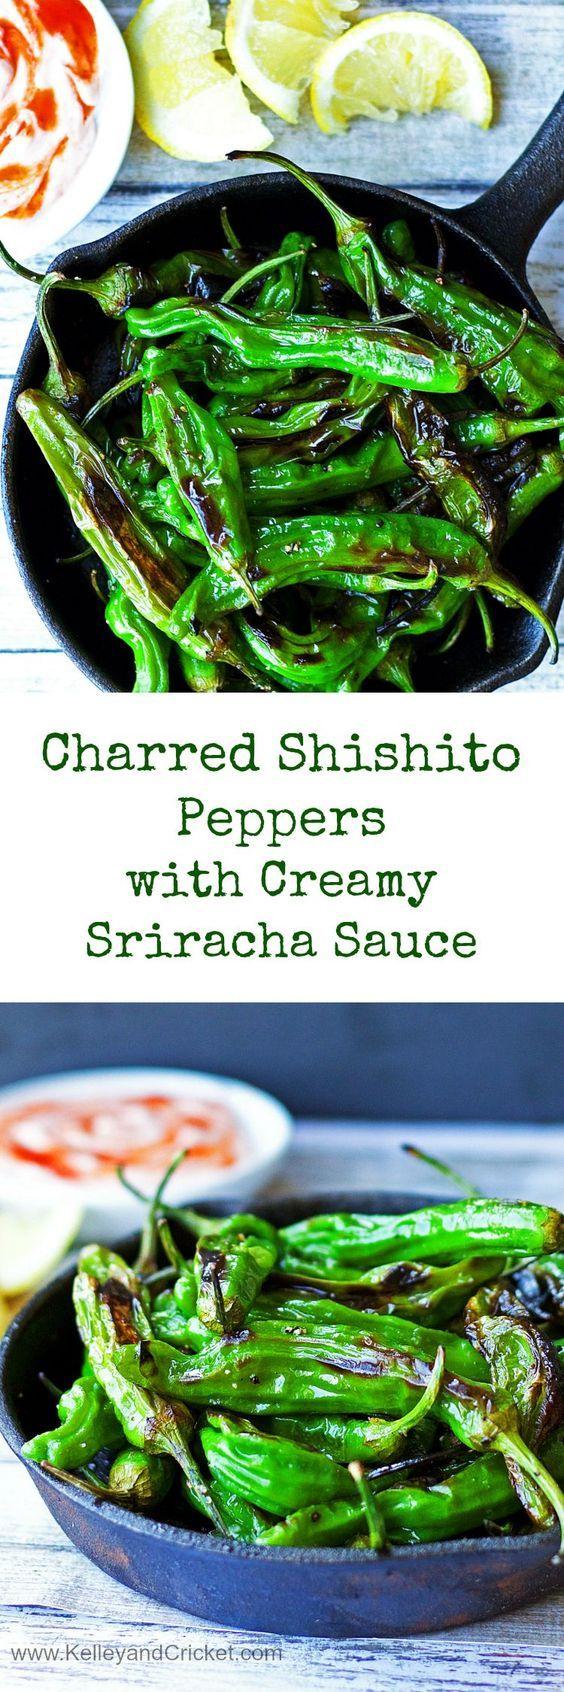 Smokey charred shishito peppers with creamy sriracha sauce.